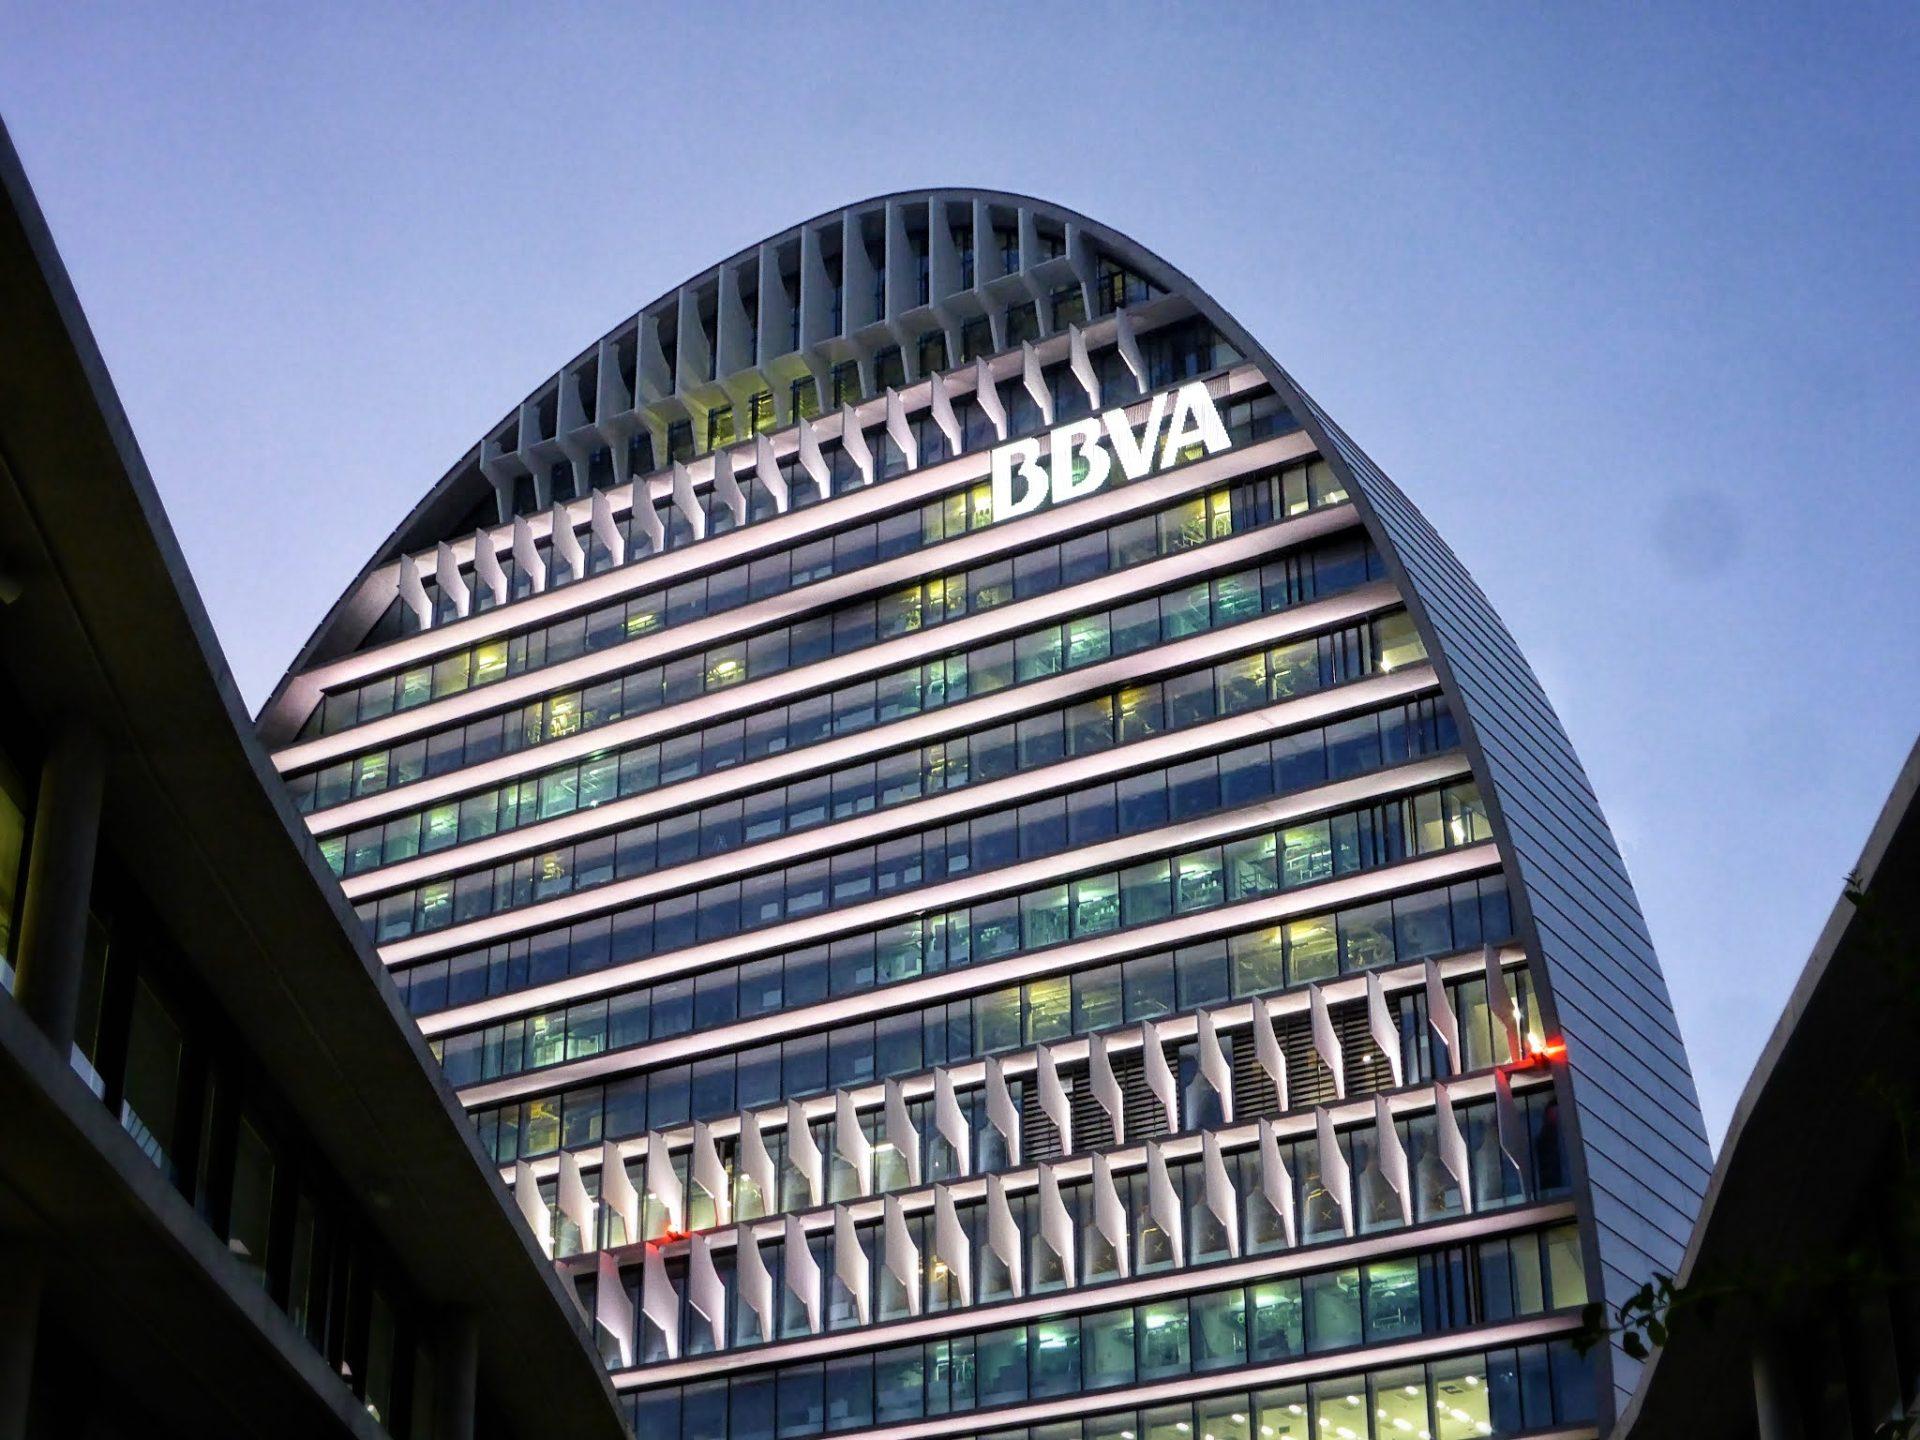 https://shareholdersandinvestors.bbva.com/wp-content/uploads/2019/02/12.-La-Vela-Ciudad-BBVA-1920x1440.jpg